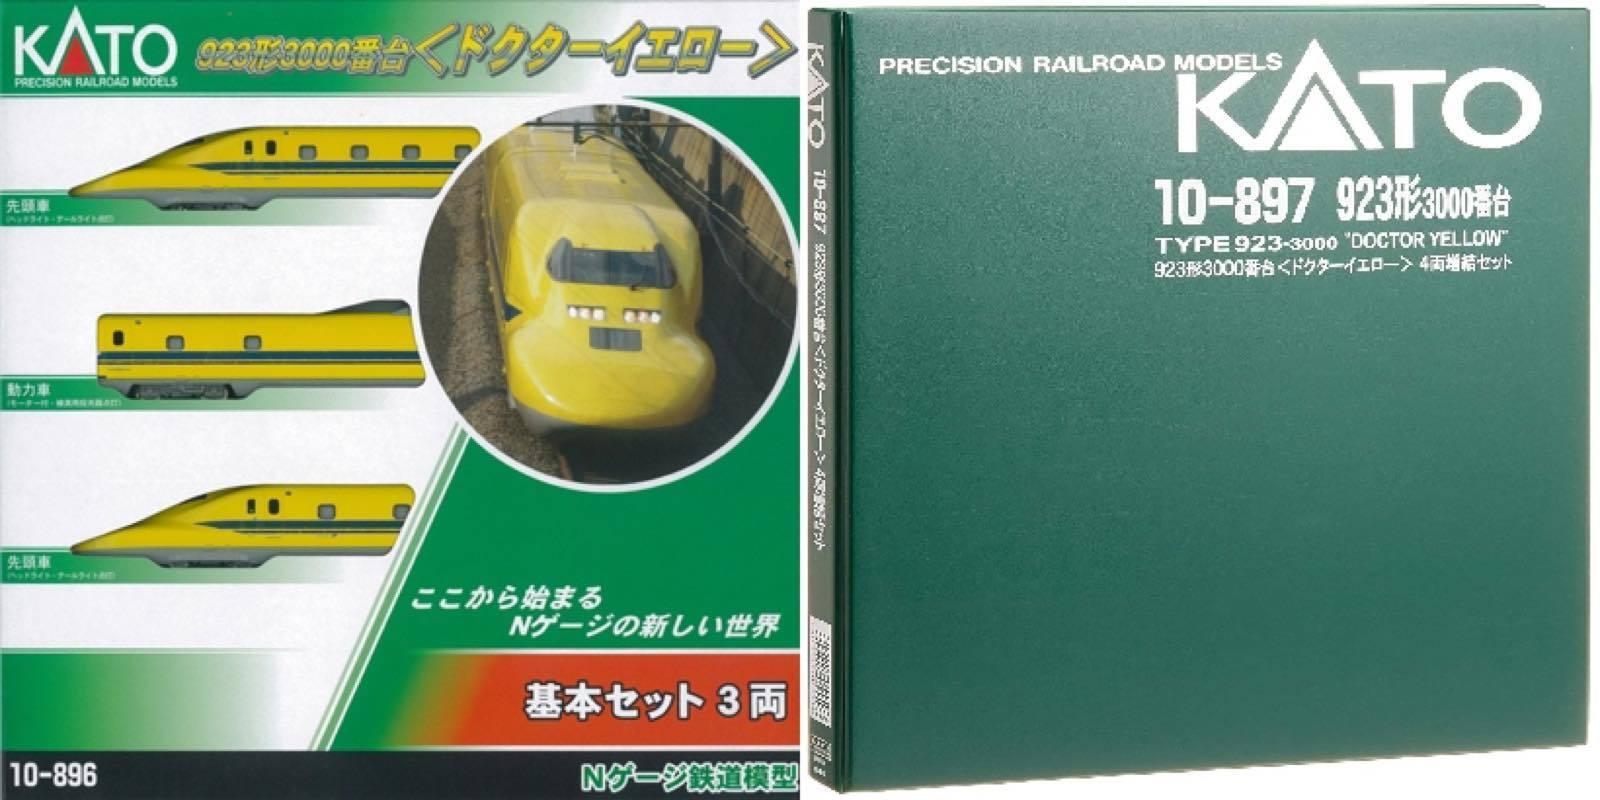 Kato 10-896 10-897 JR Shinkansen 923 'Doctor Yellow' 7 Cars FULL Set N scale FS